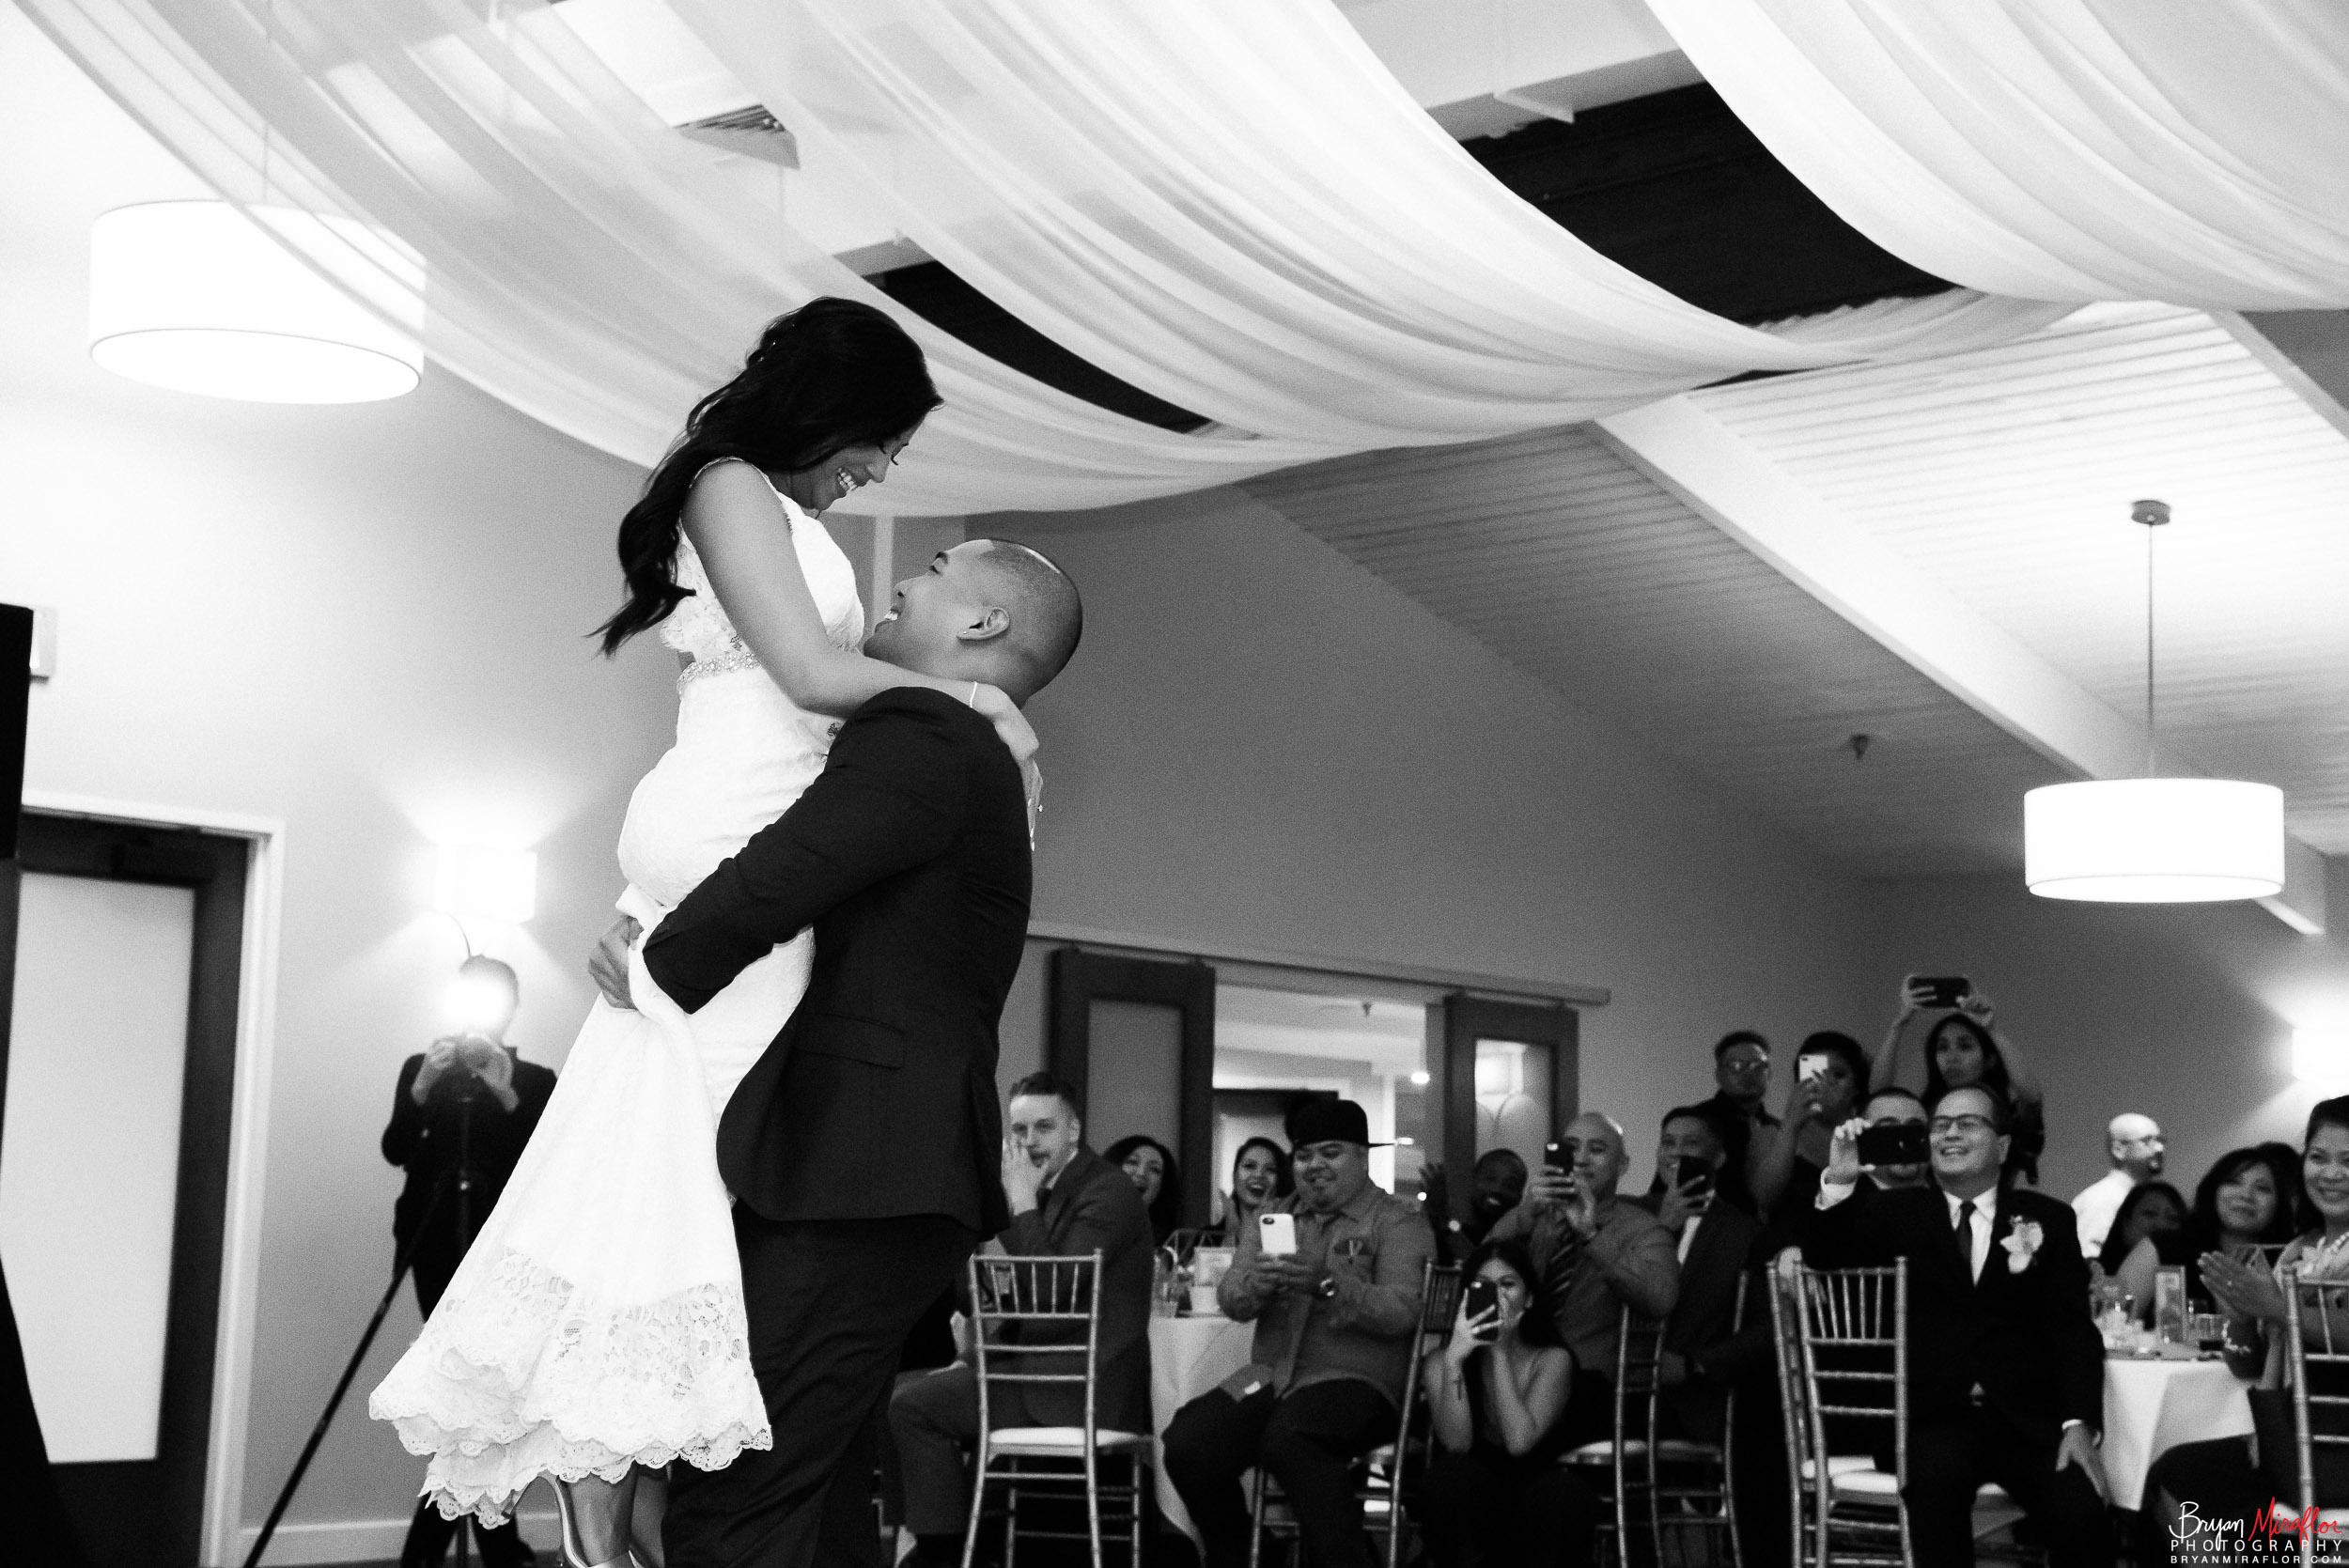 Bryan-Miraflor-Photography-Trisha-Dexter-Married-20170923-065.jpg